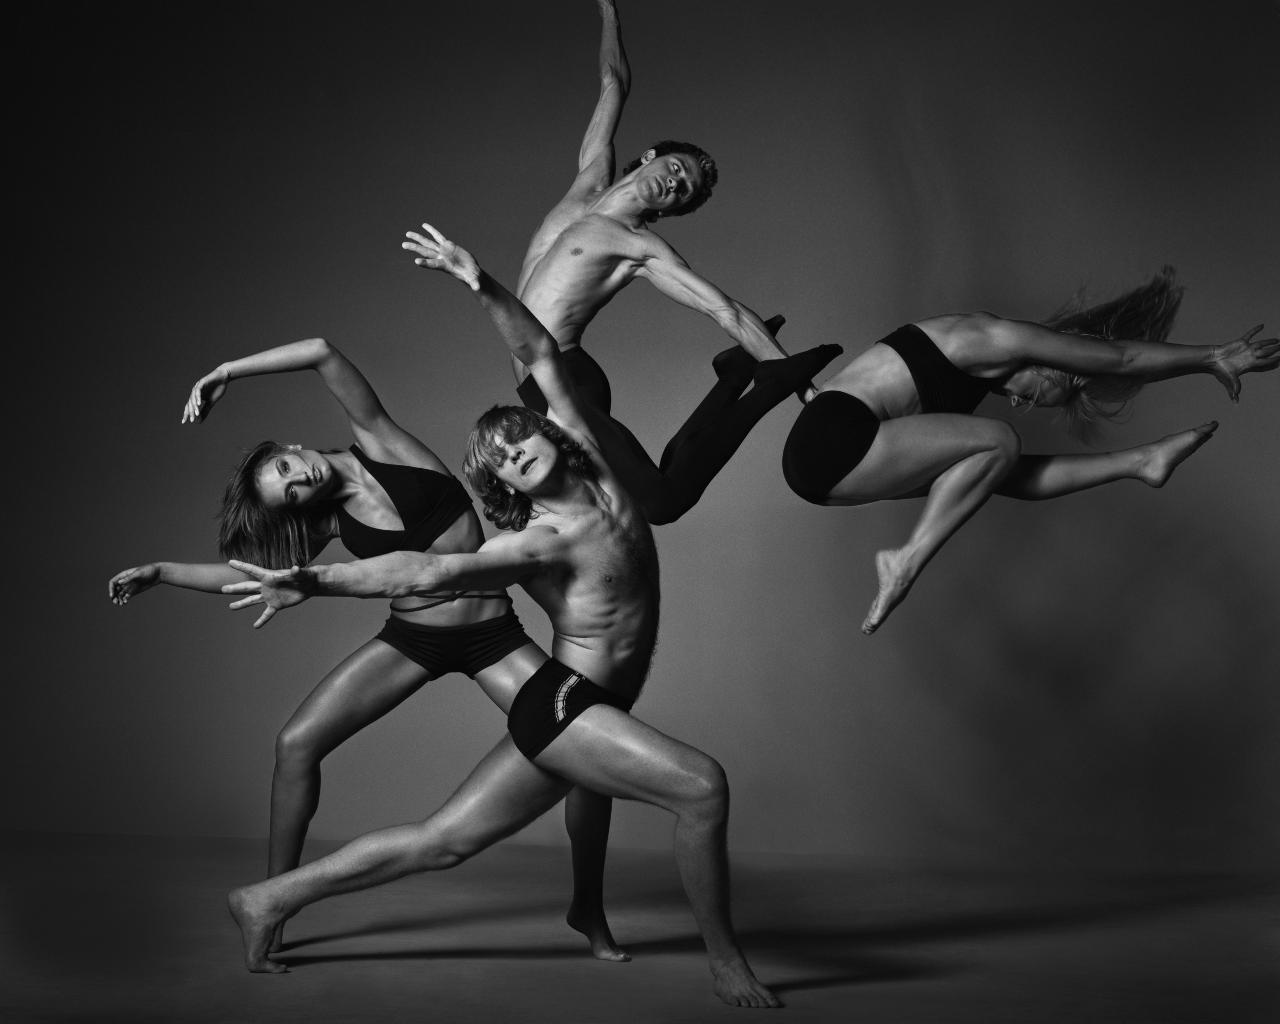 Ballet Dance Wallpapers Hd Dodskypict: Desiree Huffman: Dance Background